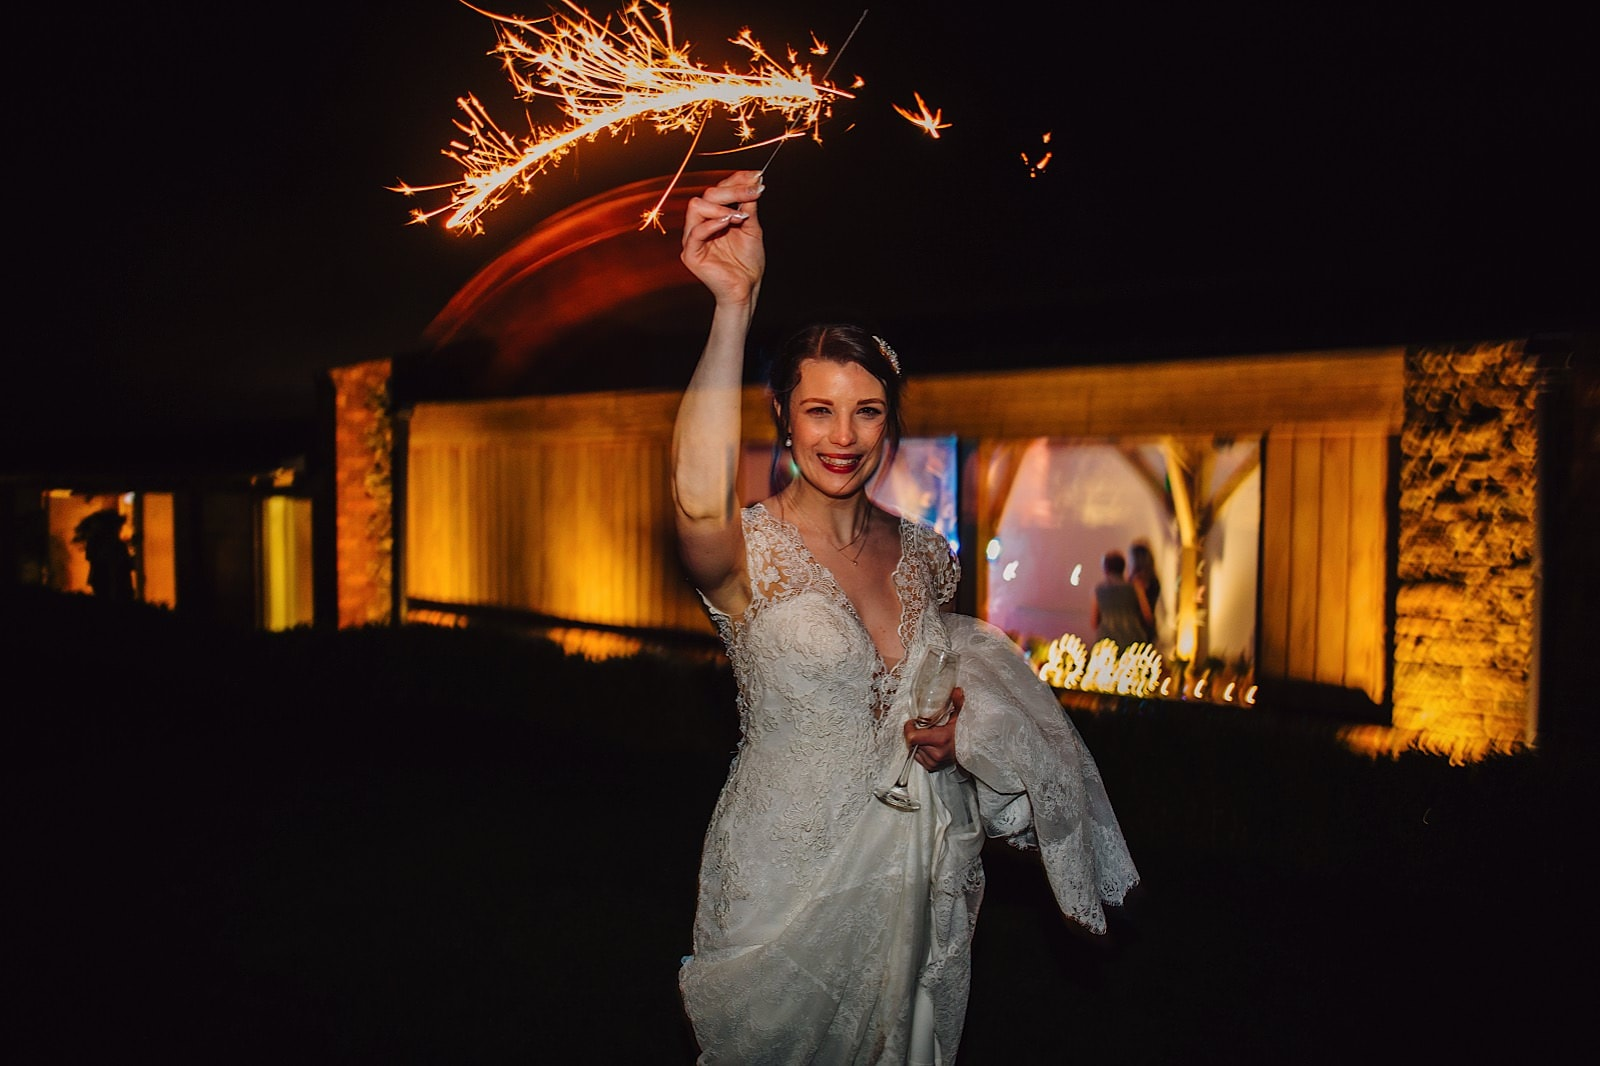 dodford manor northamptonshire wedding photography 0075